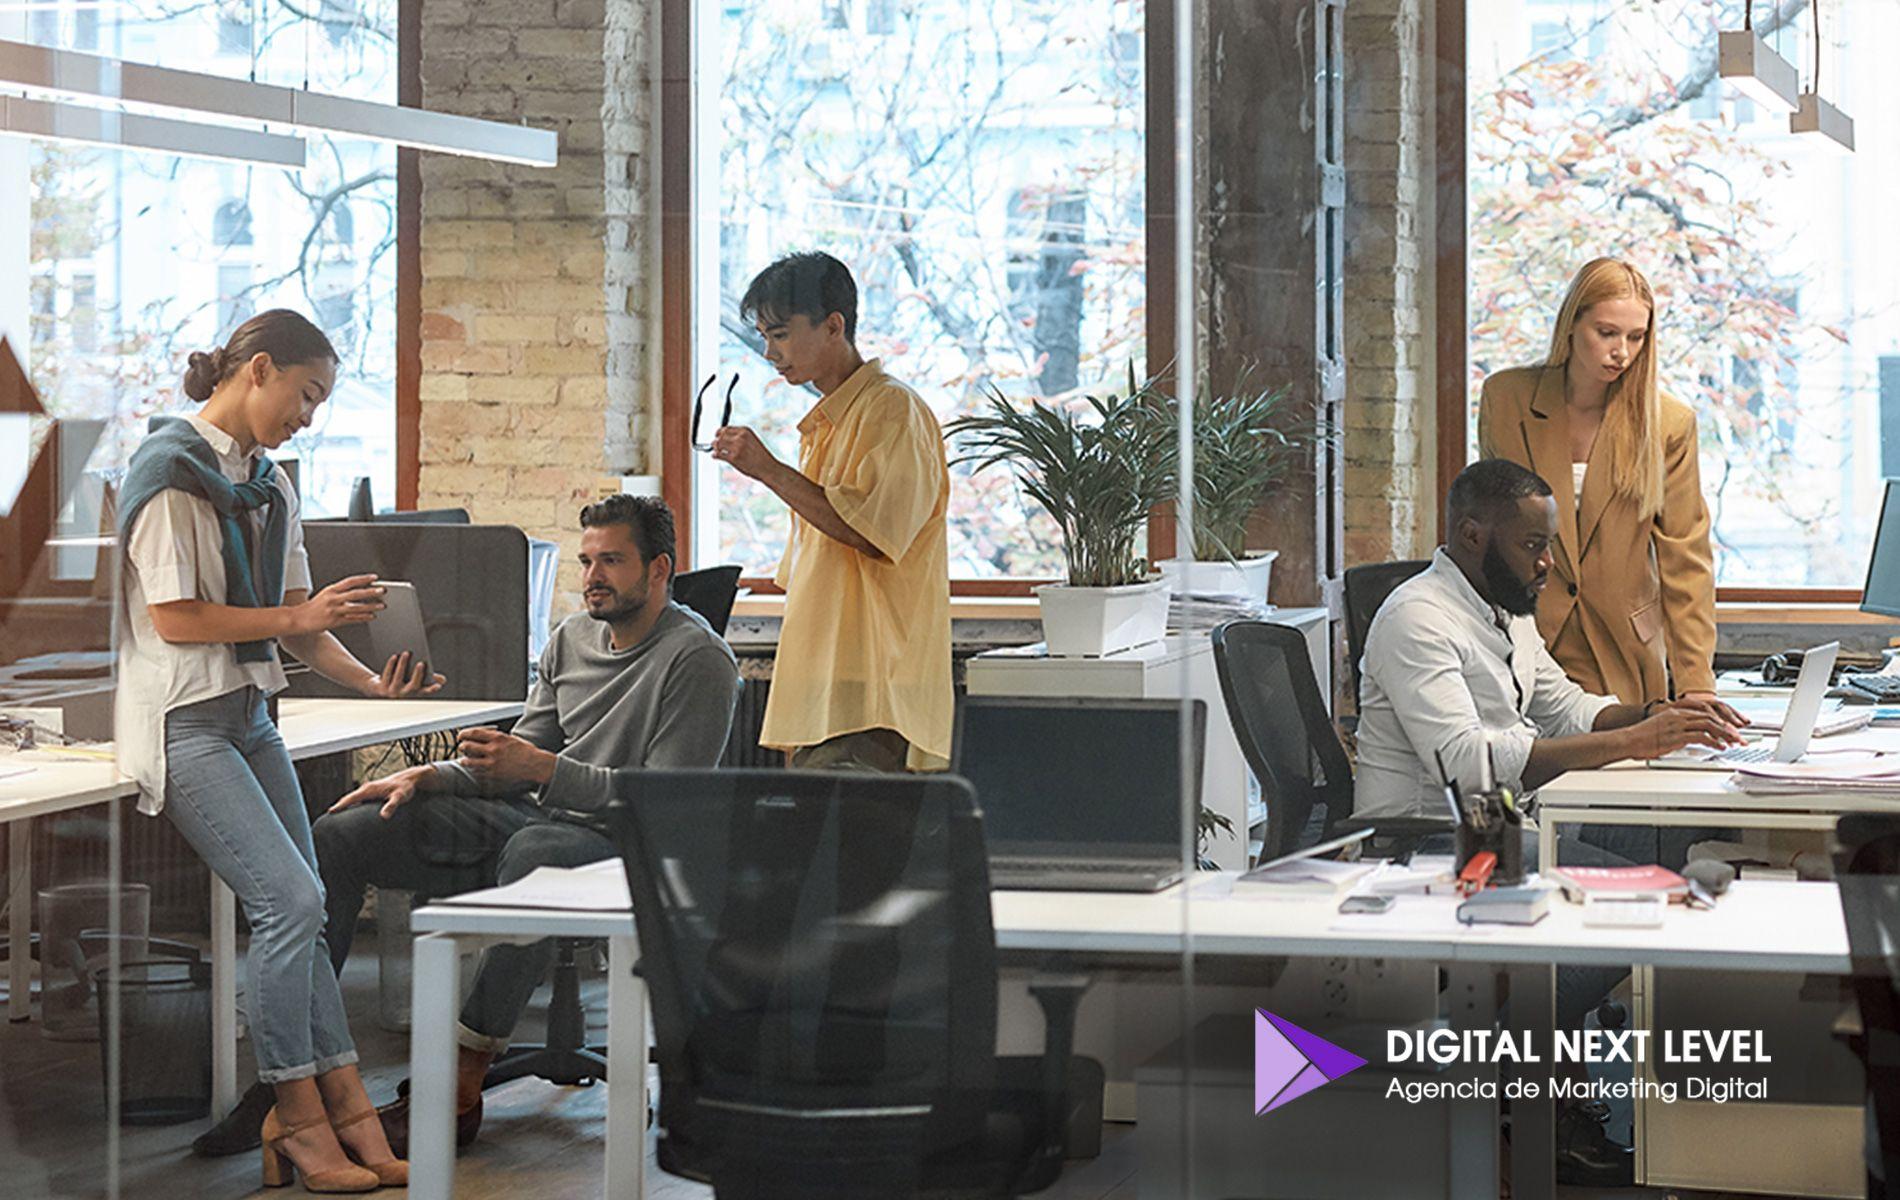 Nace Digital Next Level, agencia de Marketing Digital en Barcelona